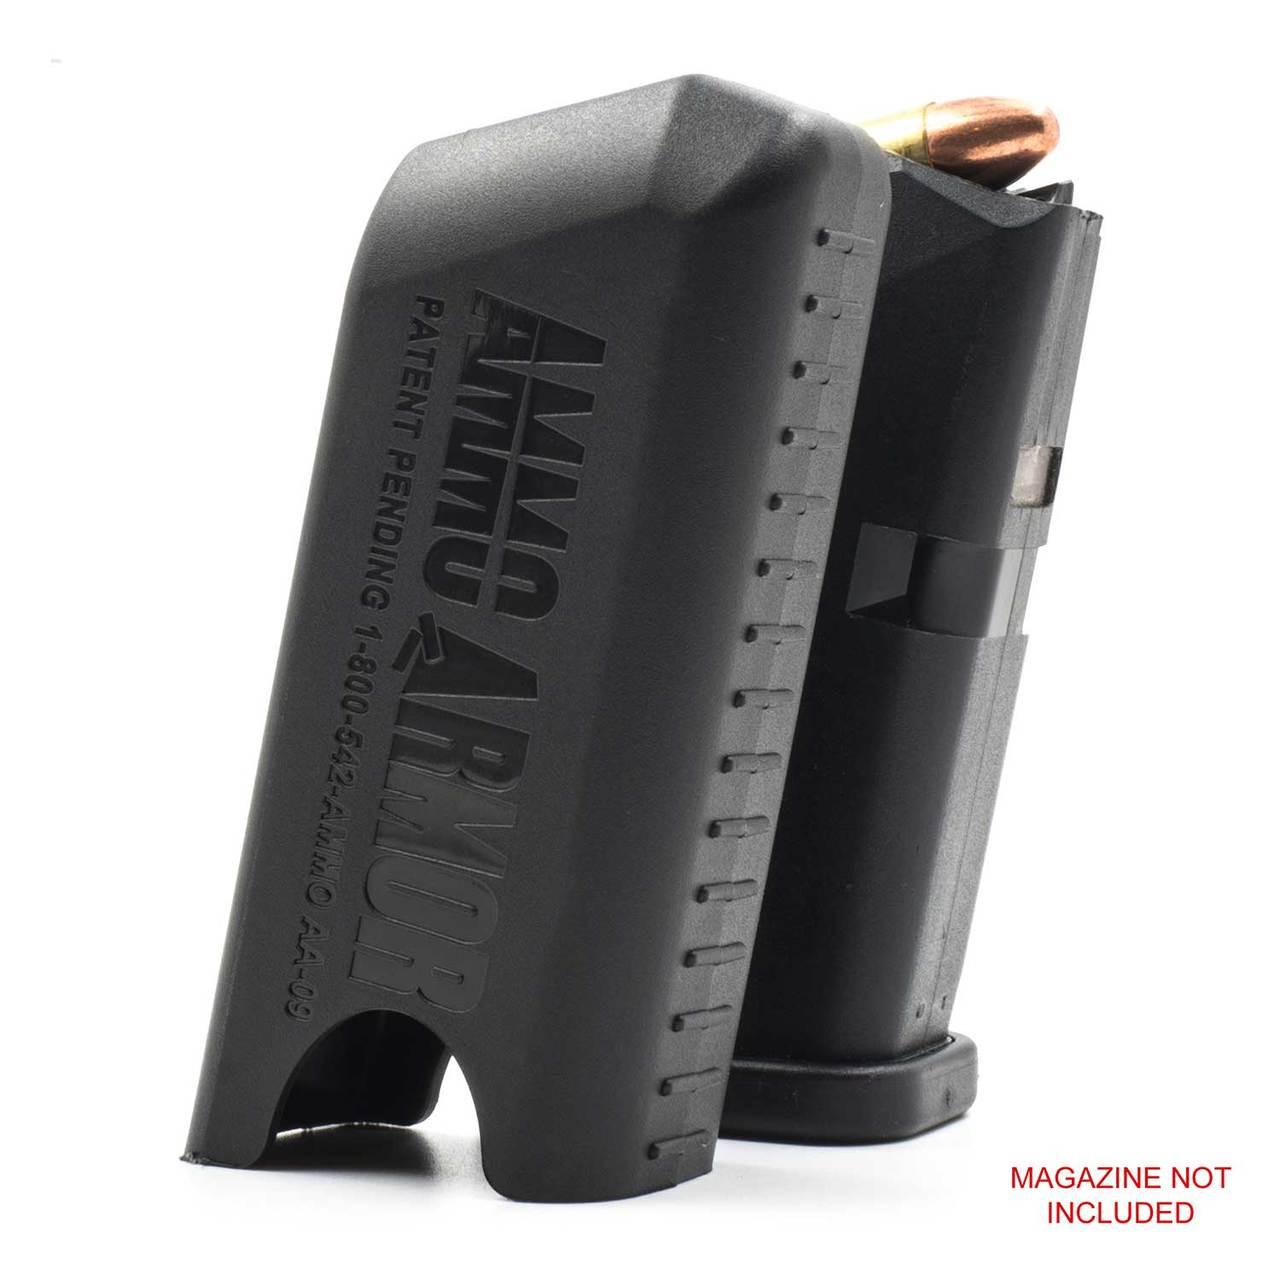 Glock 33 Magazine Protector